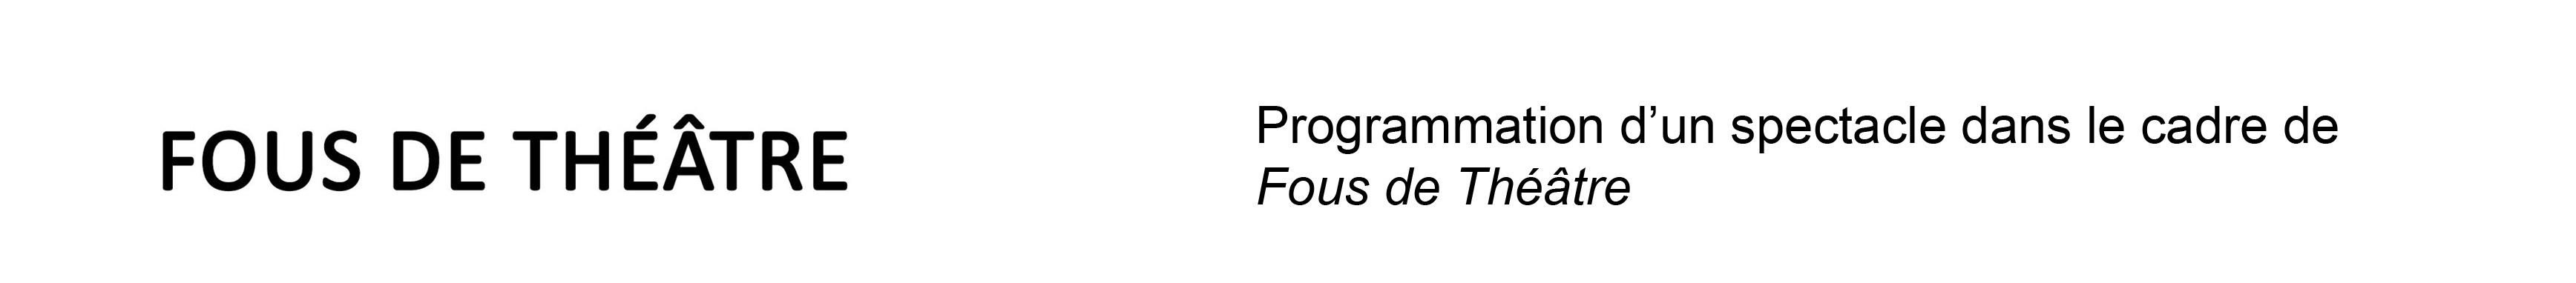 CDP_site_fousdetheatre